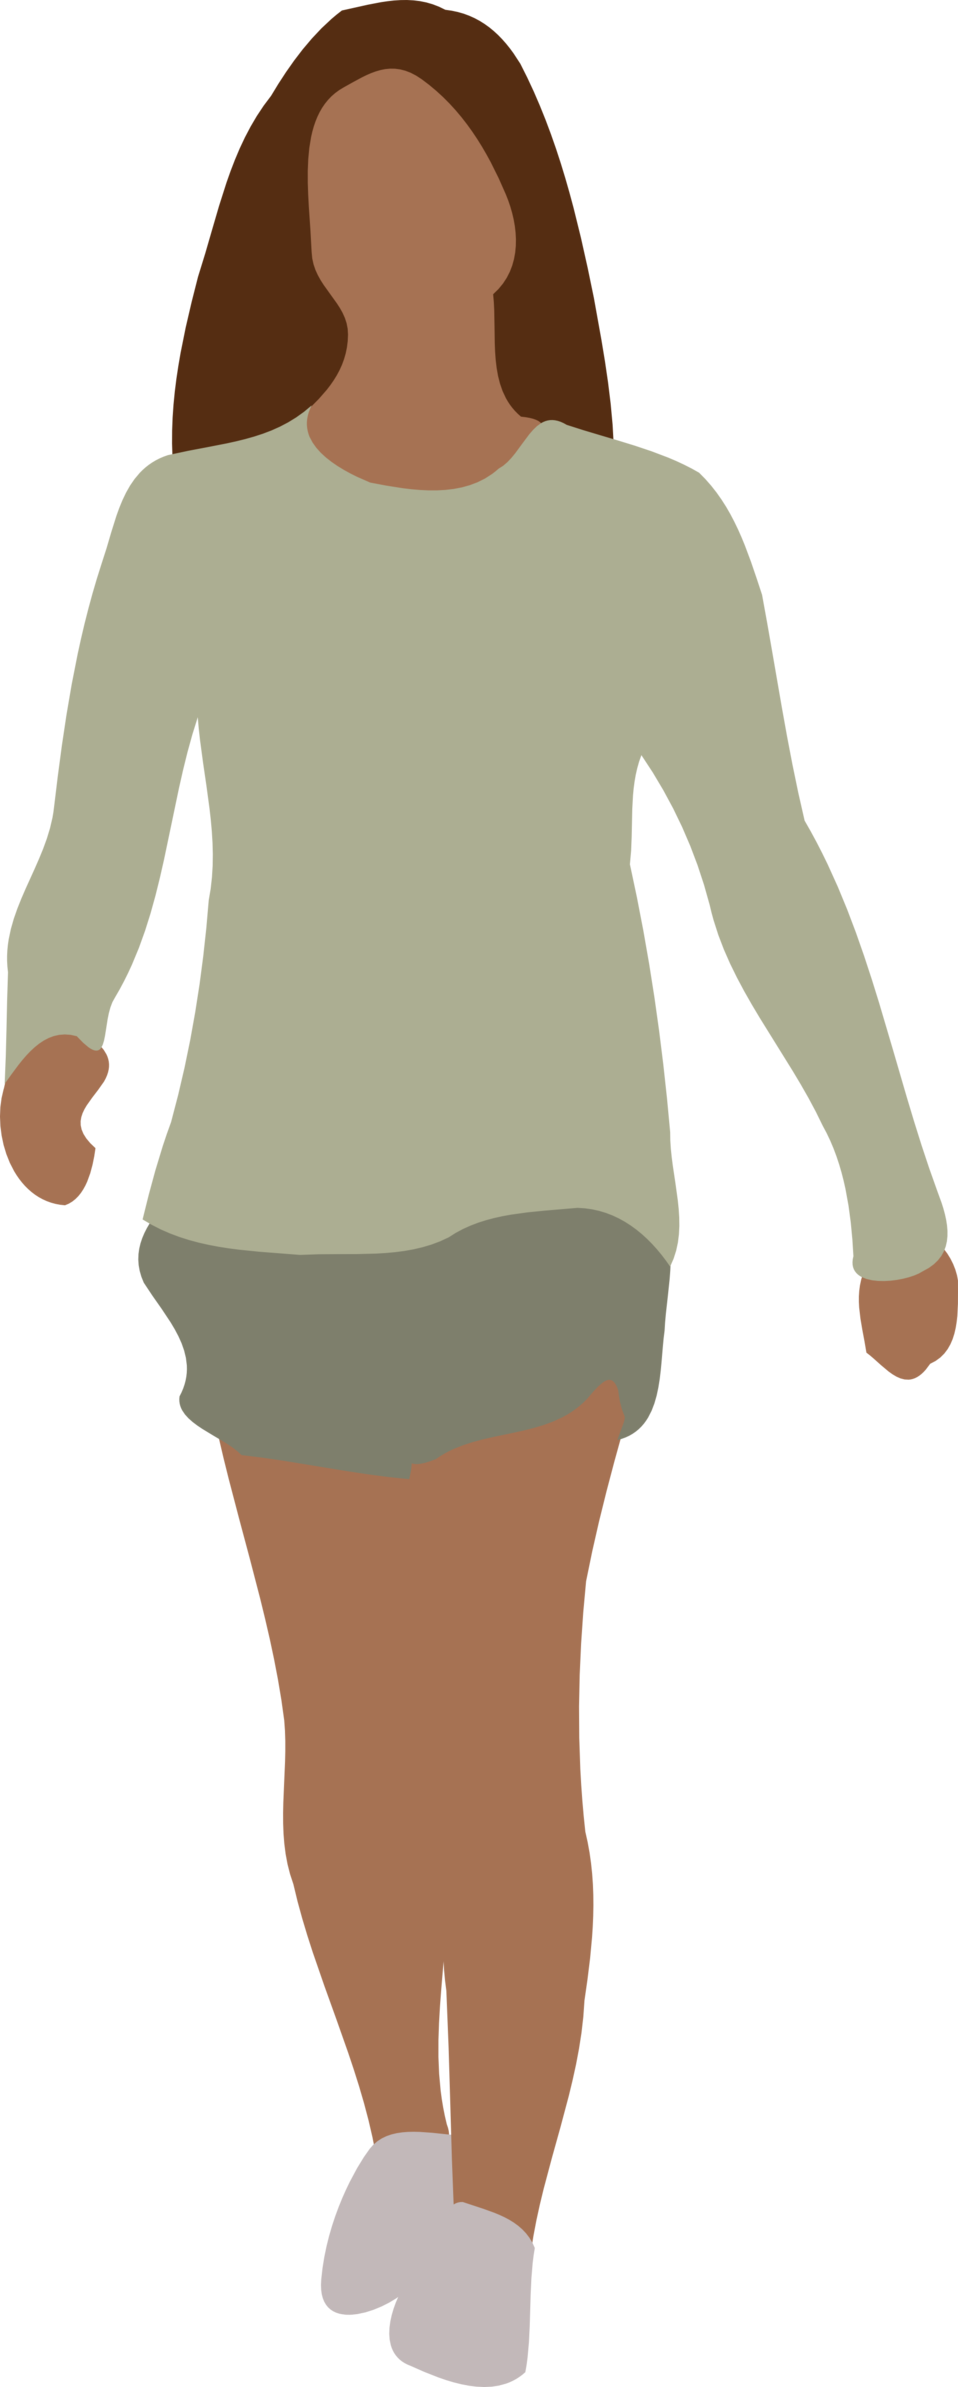 Faceless woman walking